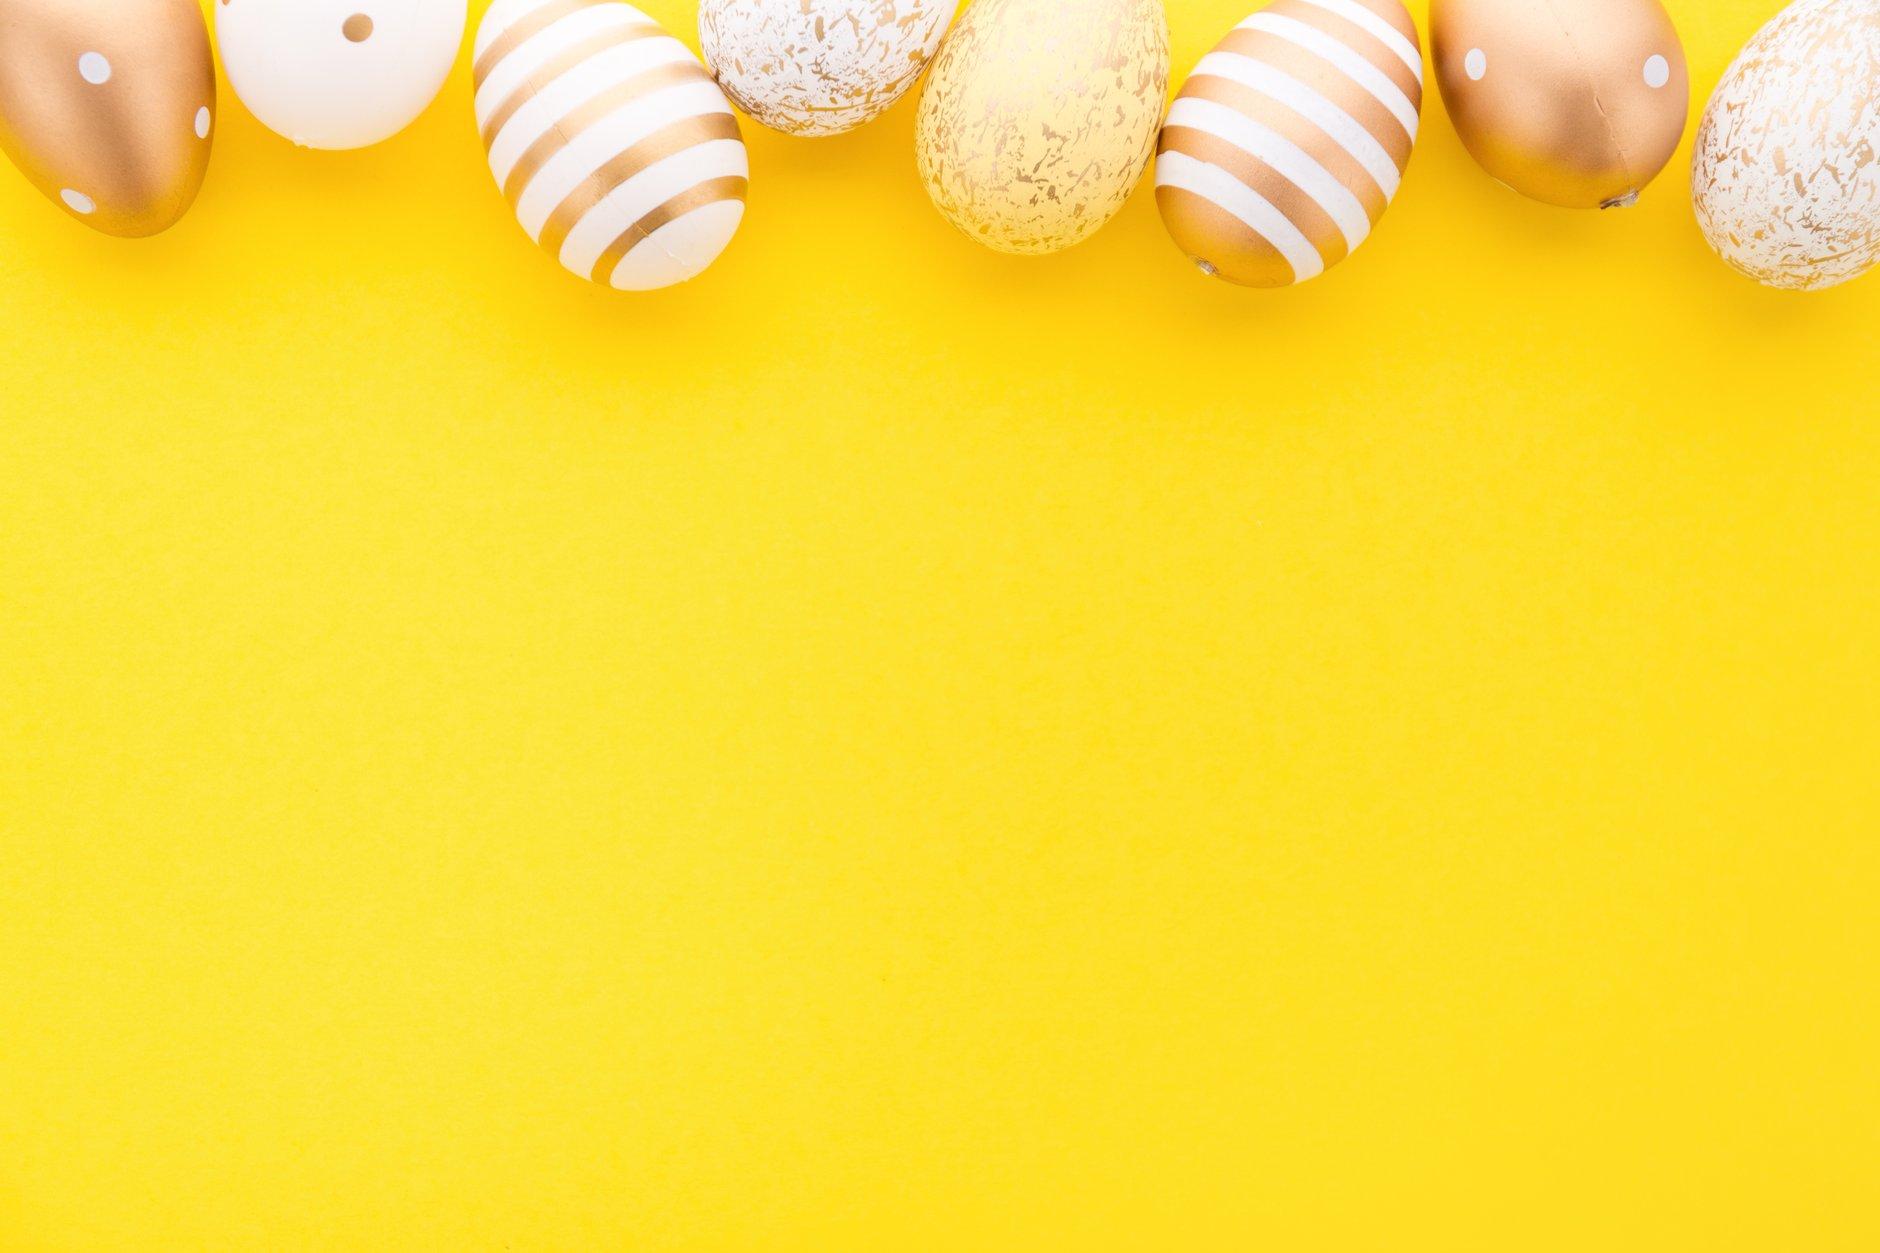 bigstock-Easter-Flat-Lay-Of-Eggs-On-Yel-289324942